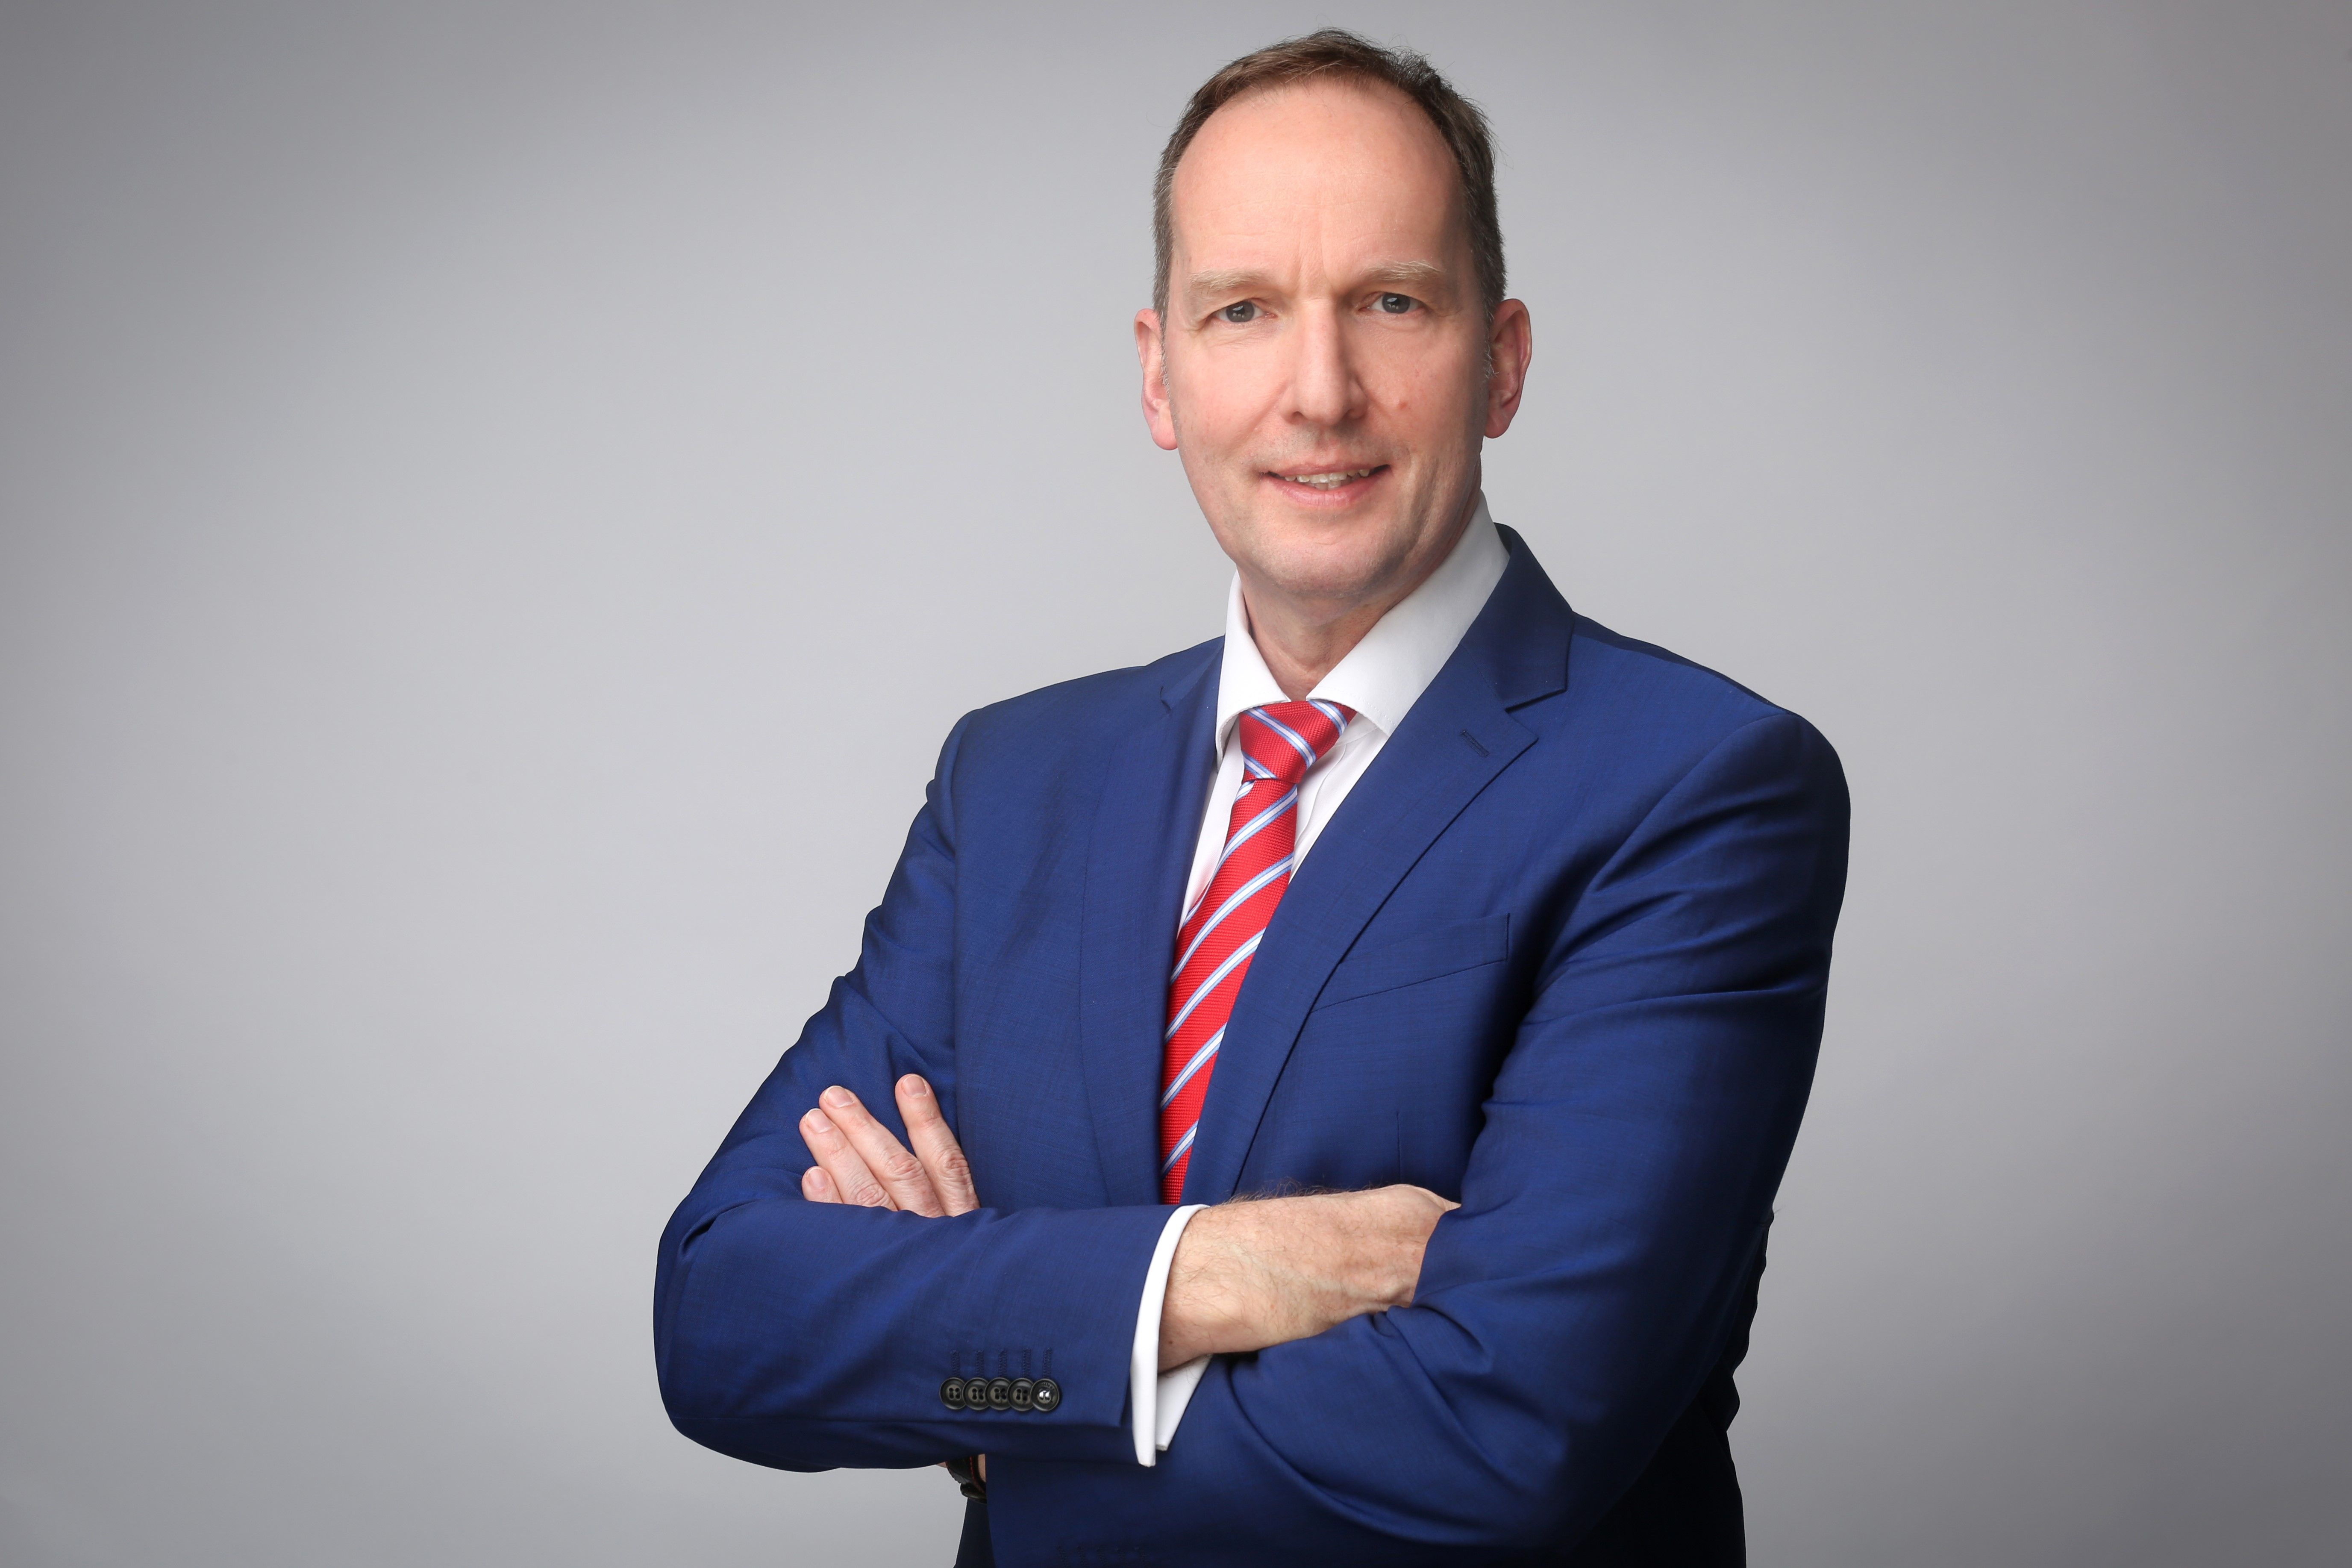 Dr. Juergen Rahmel